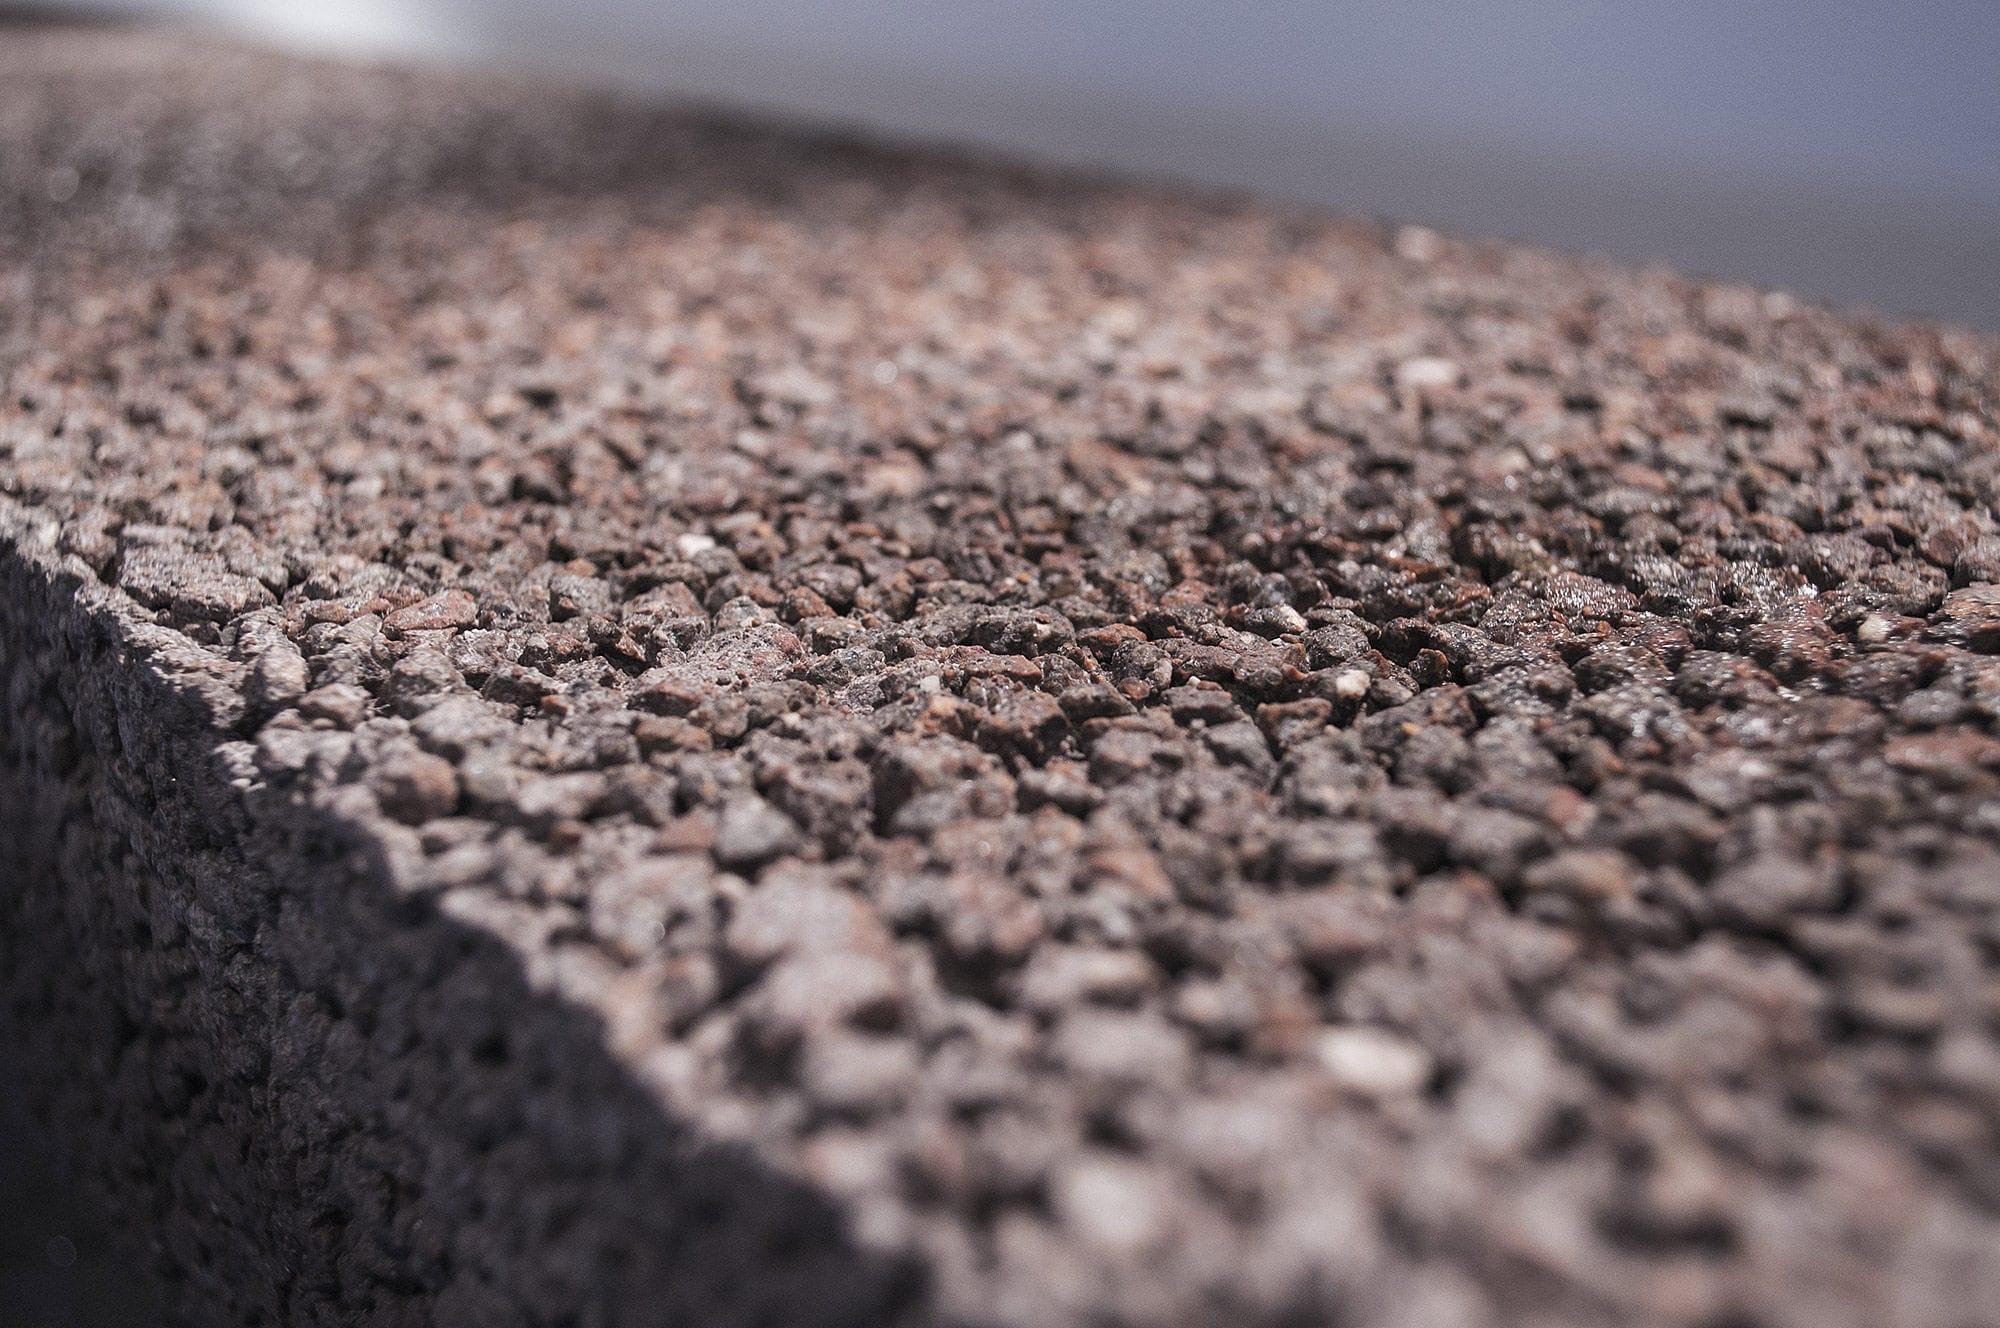 Outdoor flexible tile floor composite matte recycle favaro1 outdoor flexible tile floor composite matte recycle favaro1 dailygadgetfo Choice Image